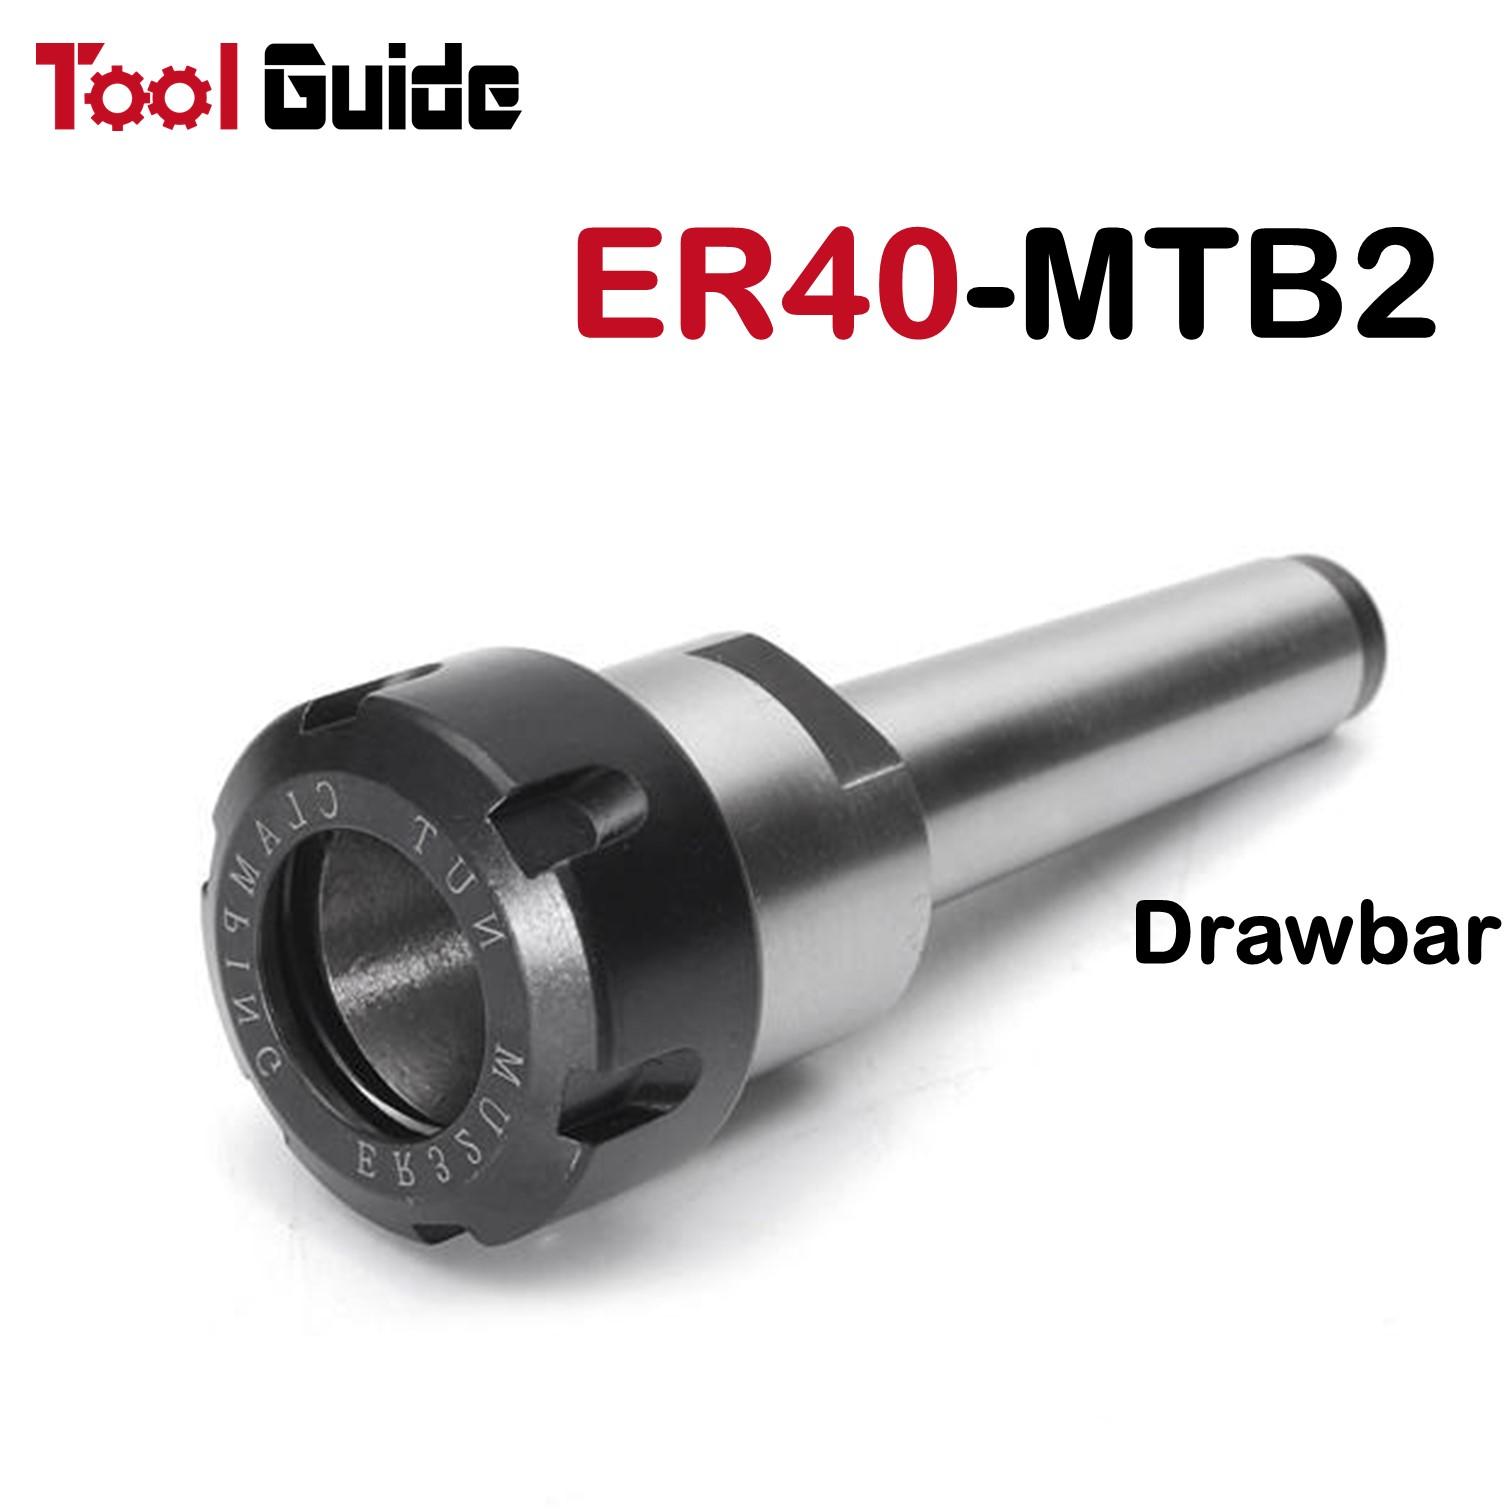 MTB2 ER25 MT2 Morse Taper Shankk Collet Chuck CNC Milling Tool Holder M10 Thread Collet Chuck